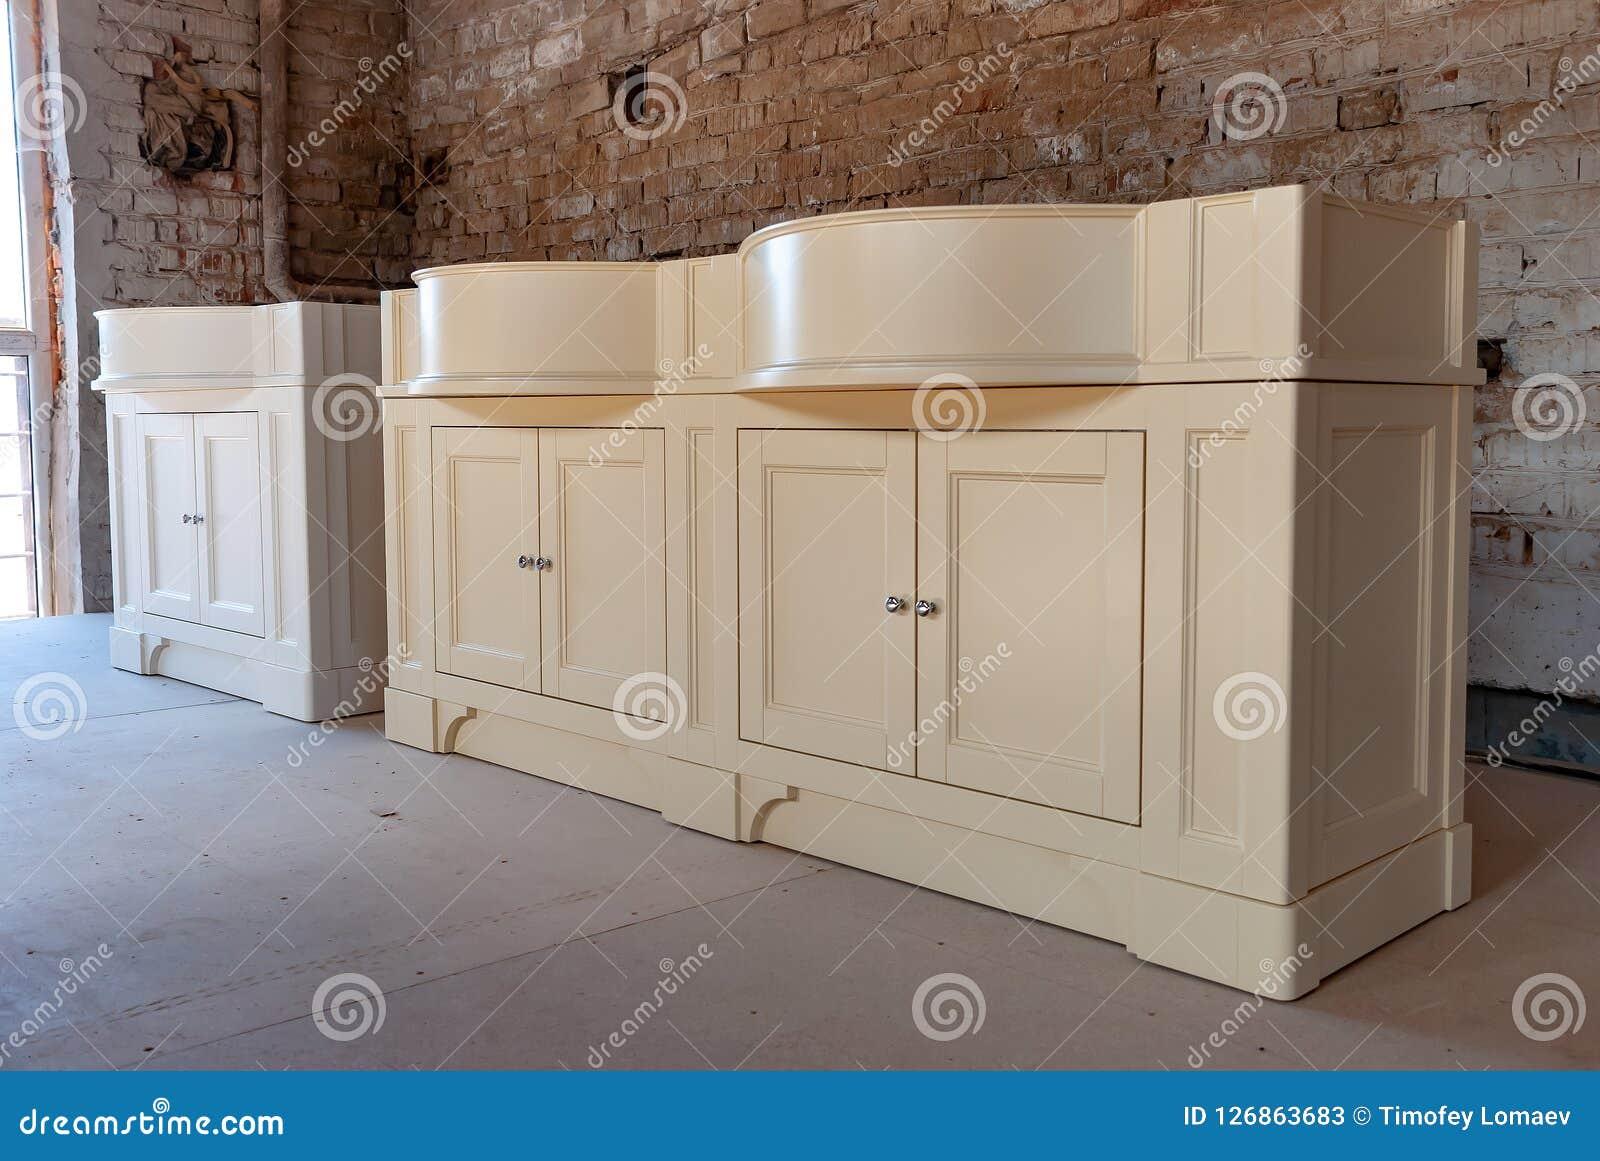 Bathroom Vanity Cabinets In Workshop Classic Furniture